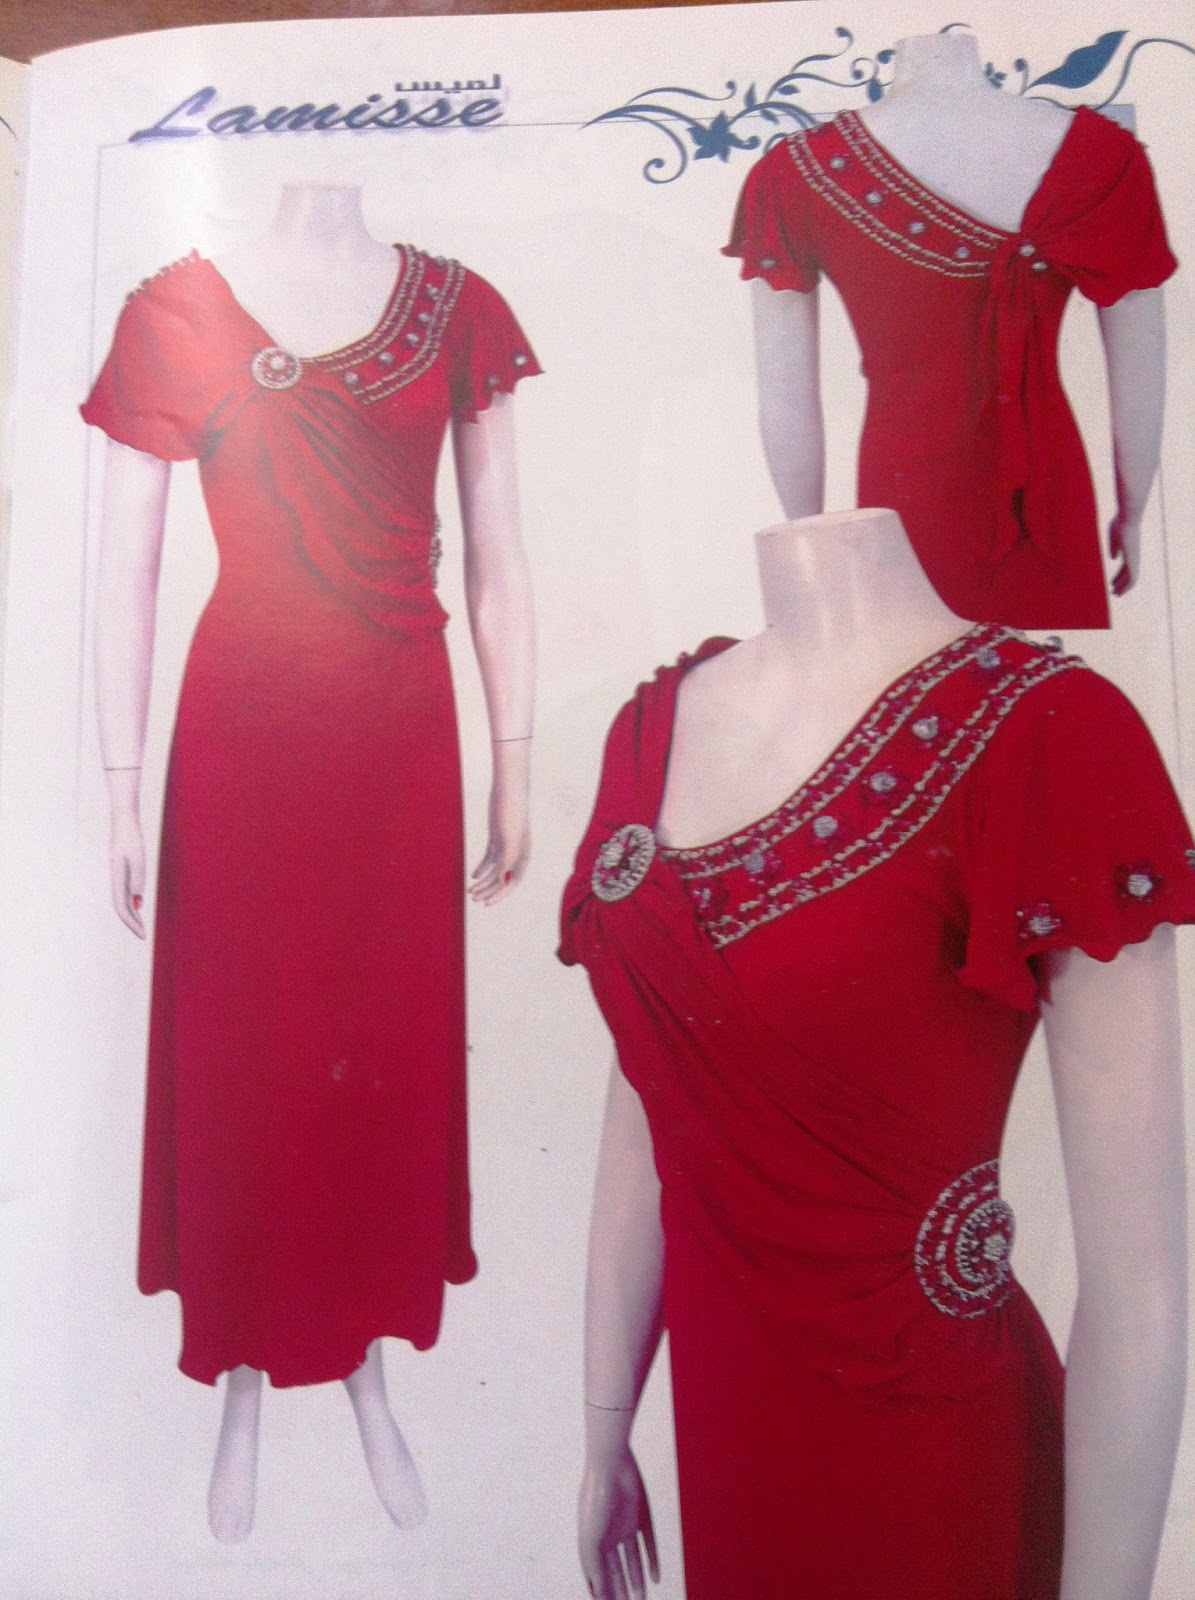 robe interieur dentelle algerienne ete 2015 holidays oo